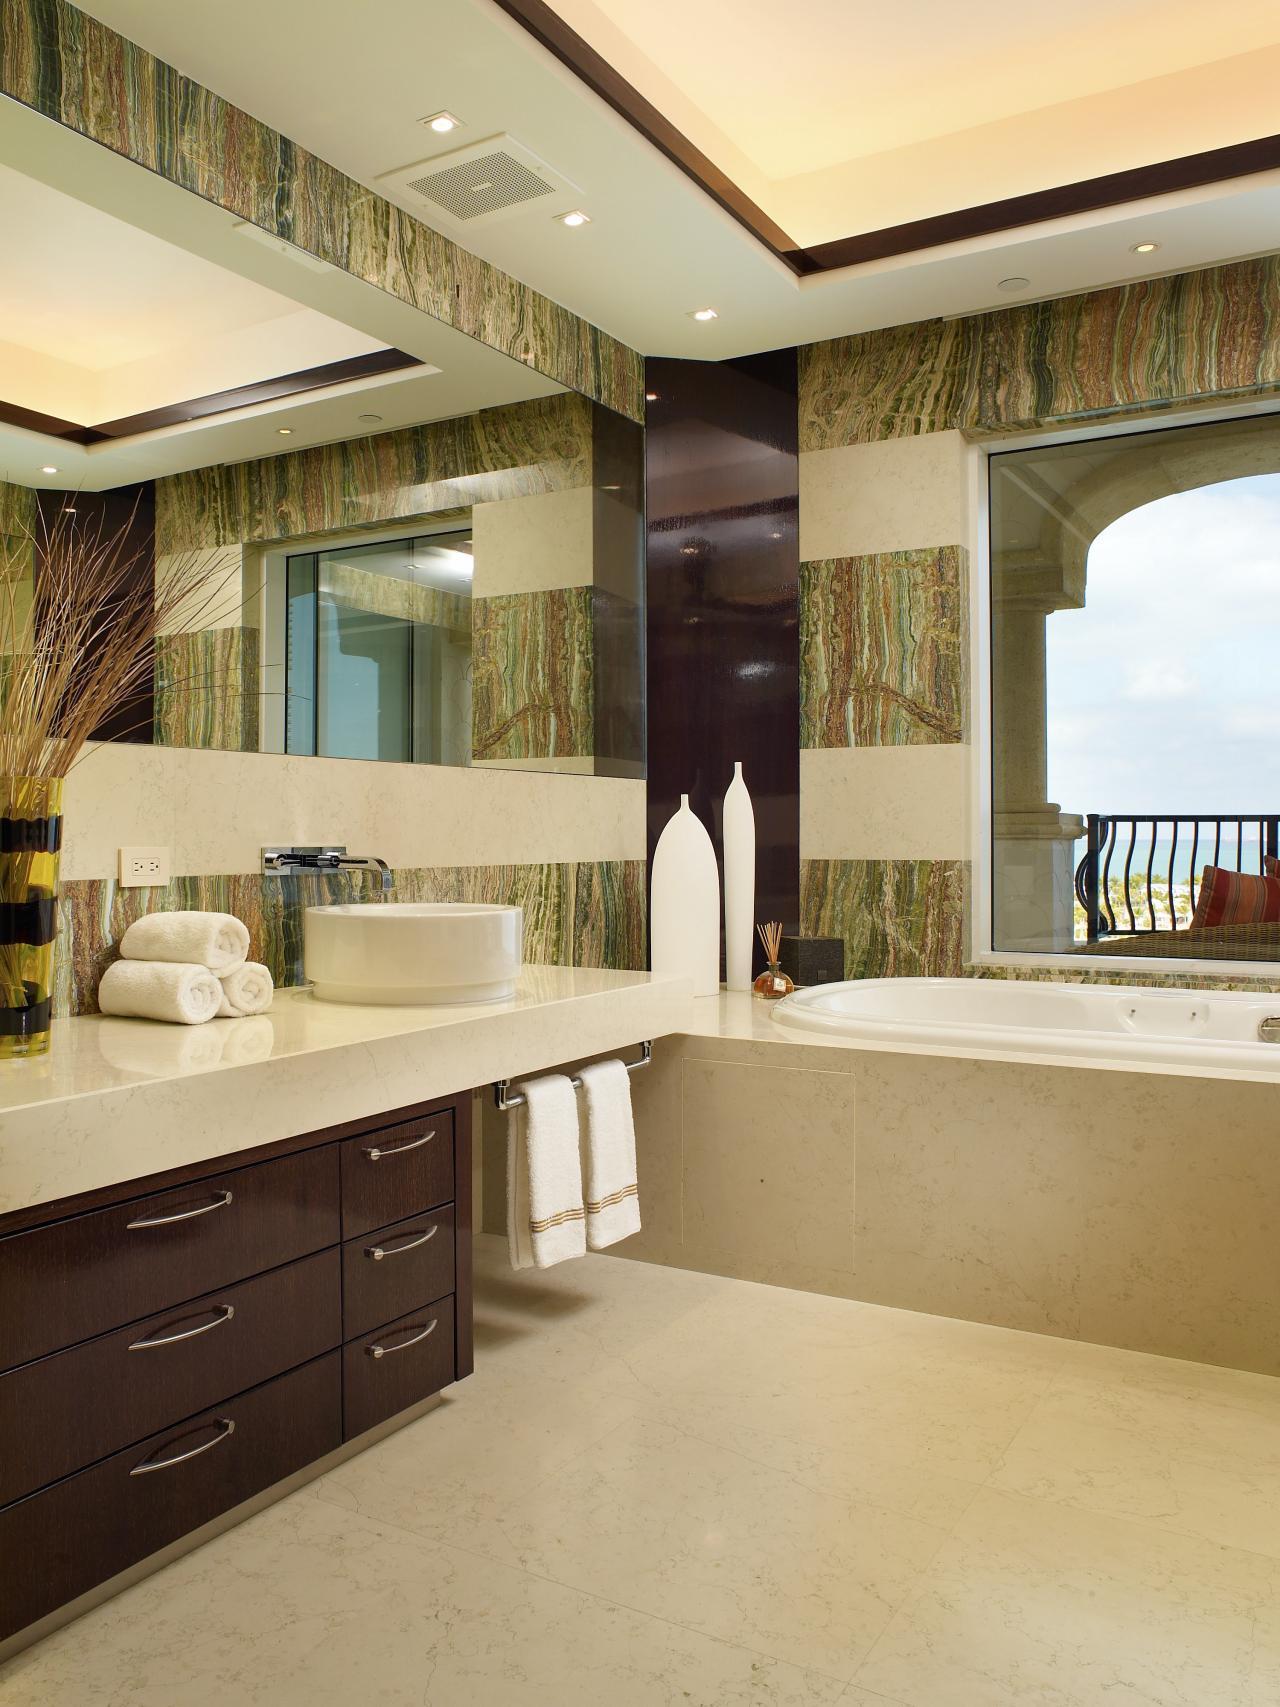 Basement Bathrooms Ideas And Designs Hgtv